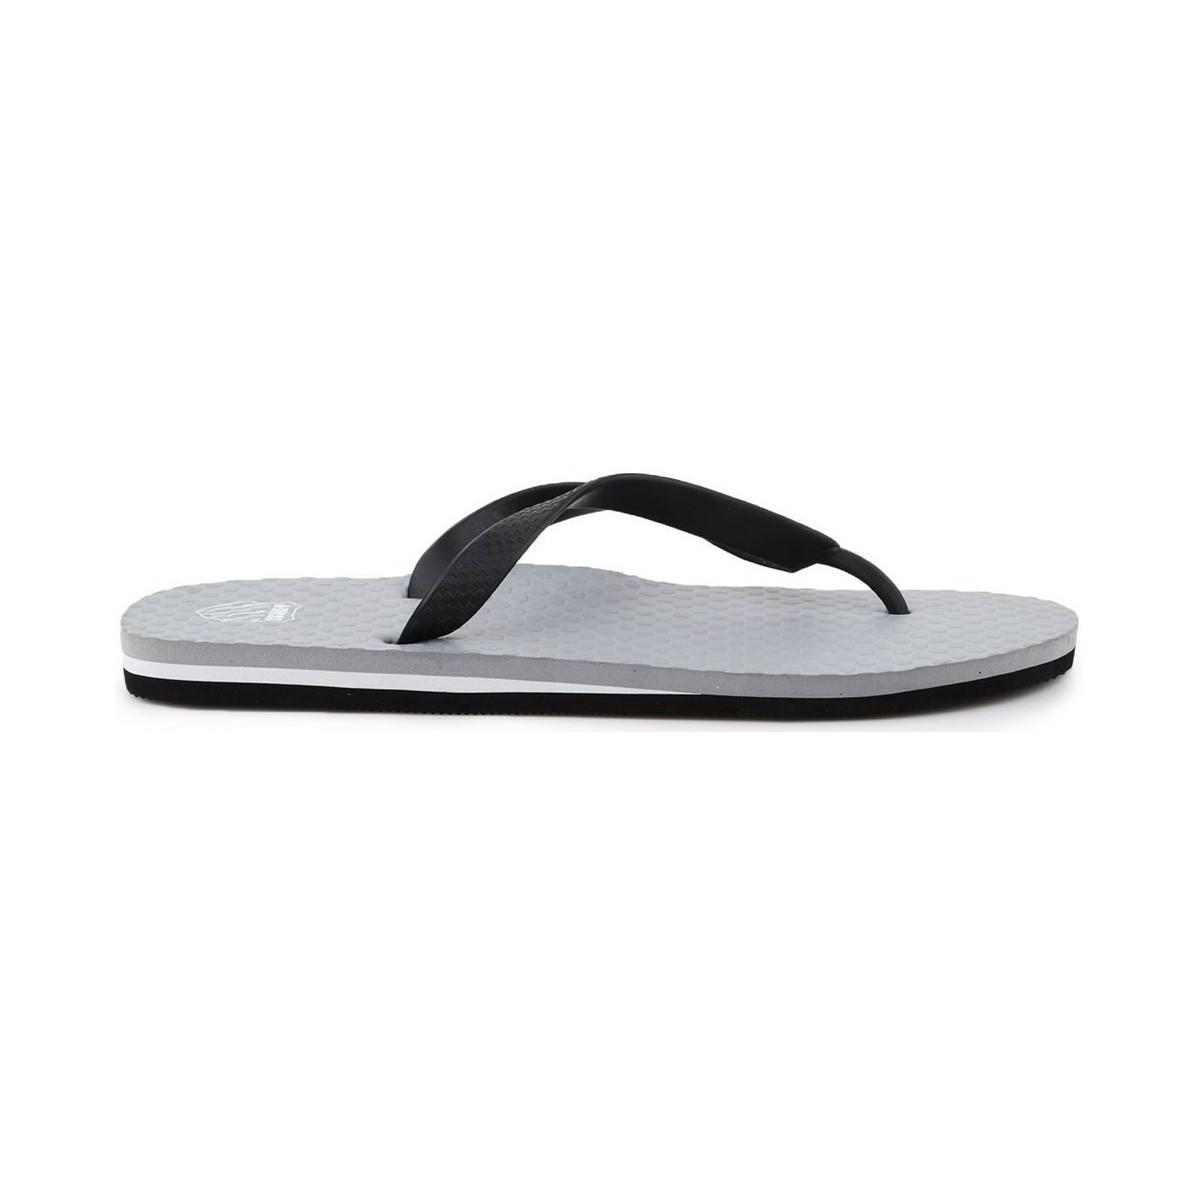 new arrival b189a 38ded K-swiss Zorrie Men's Flip Flops / Sandals (shoes) In Grey in ...